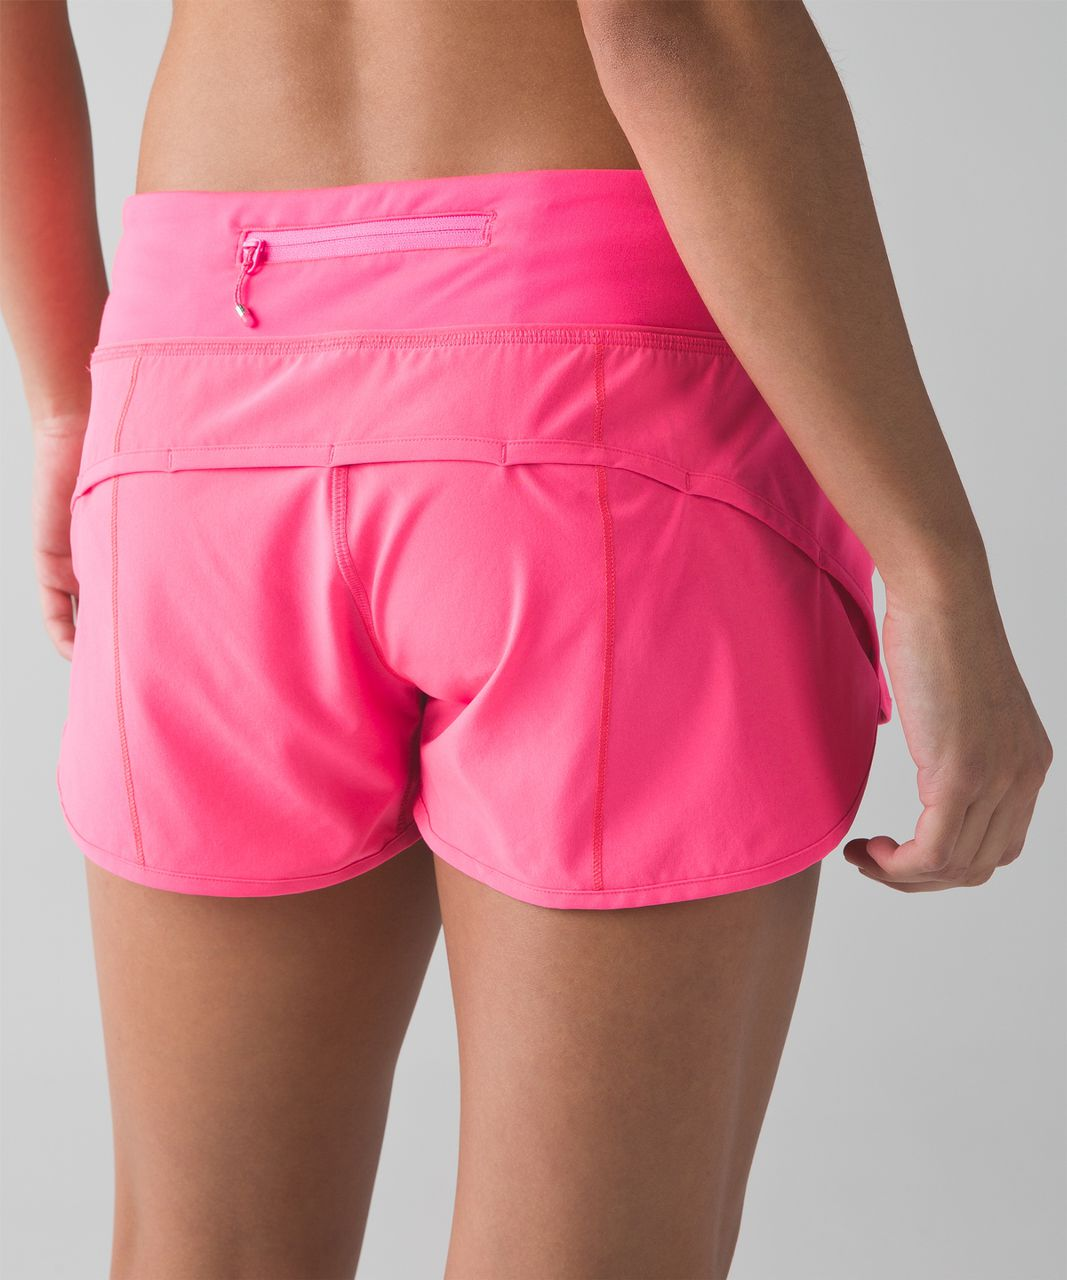 Lululemon Speed Short - Neon Pink